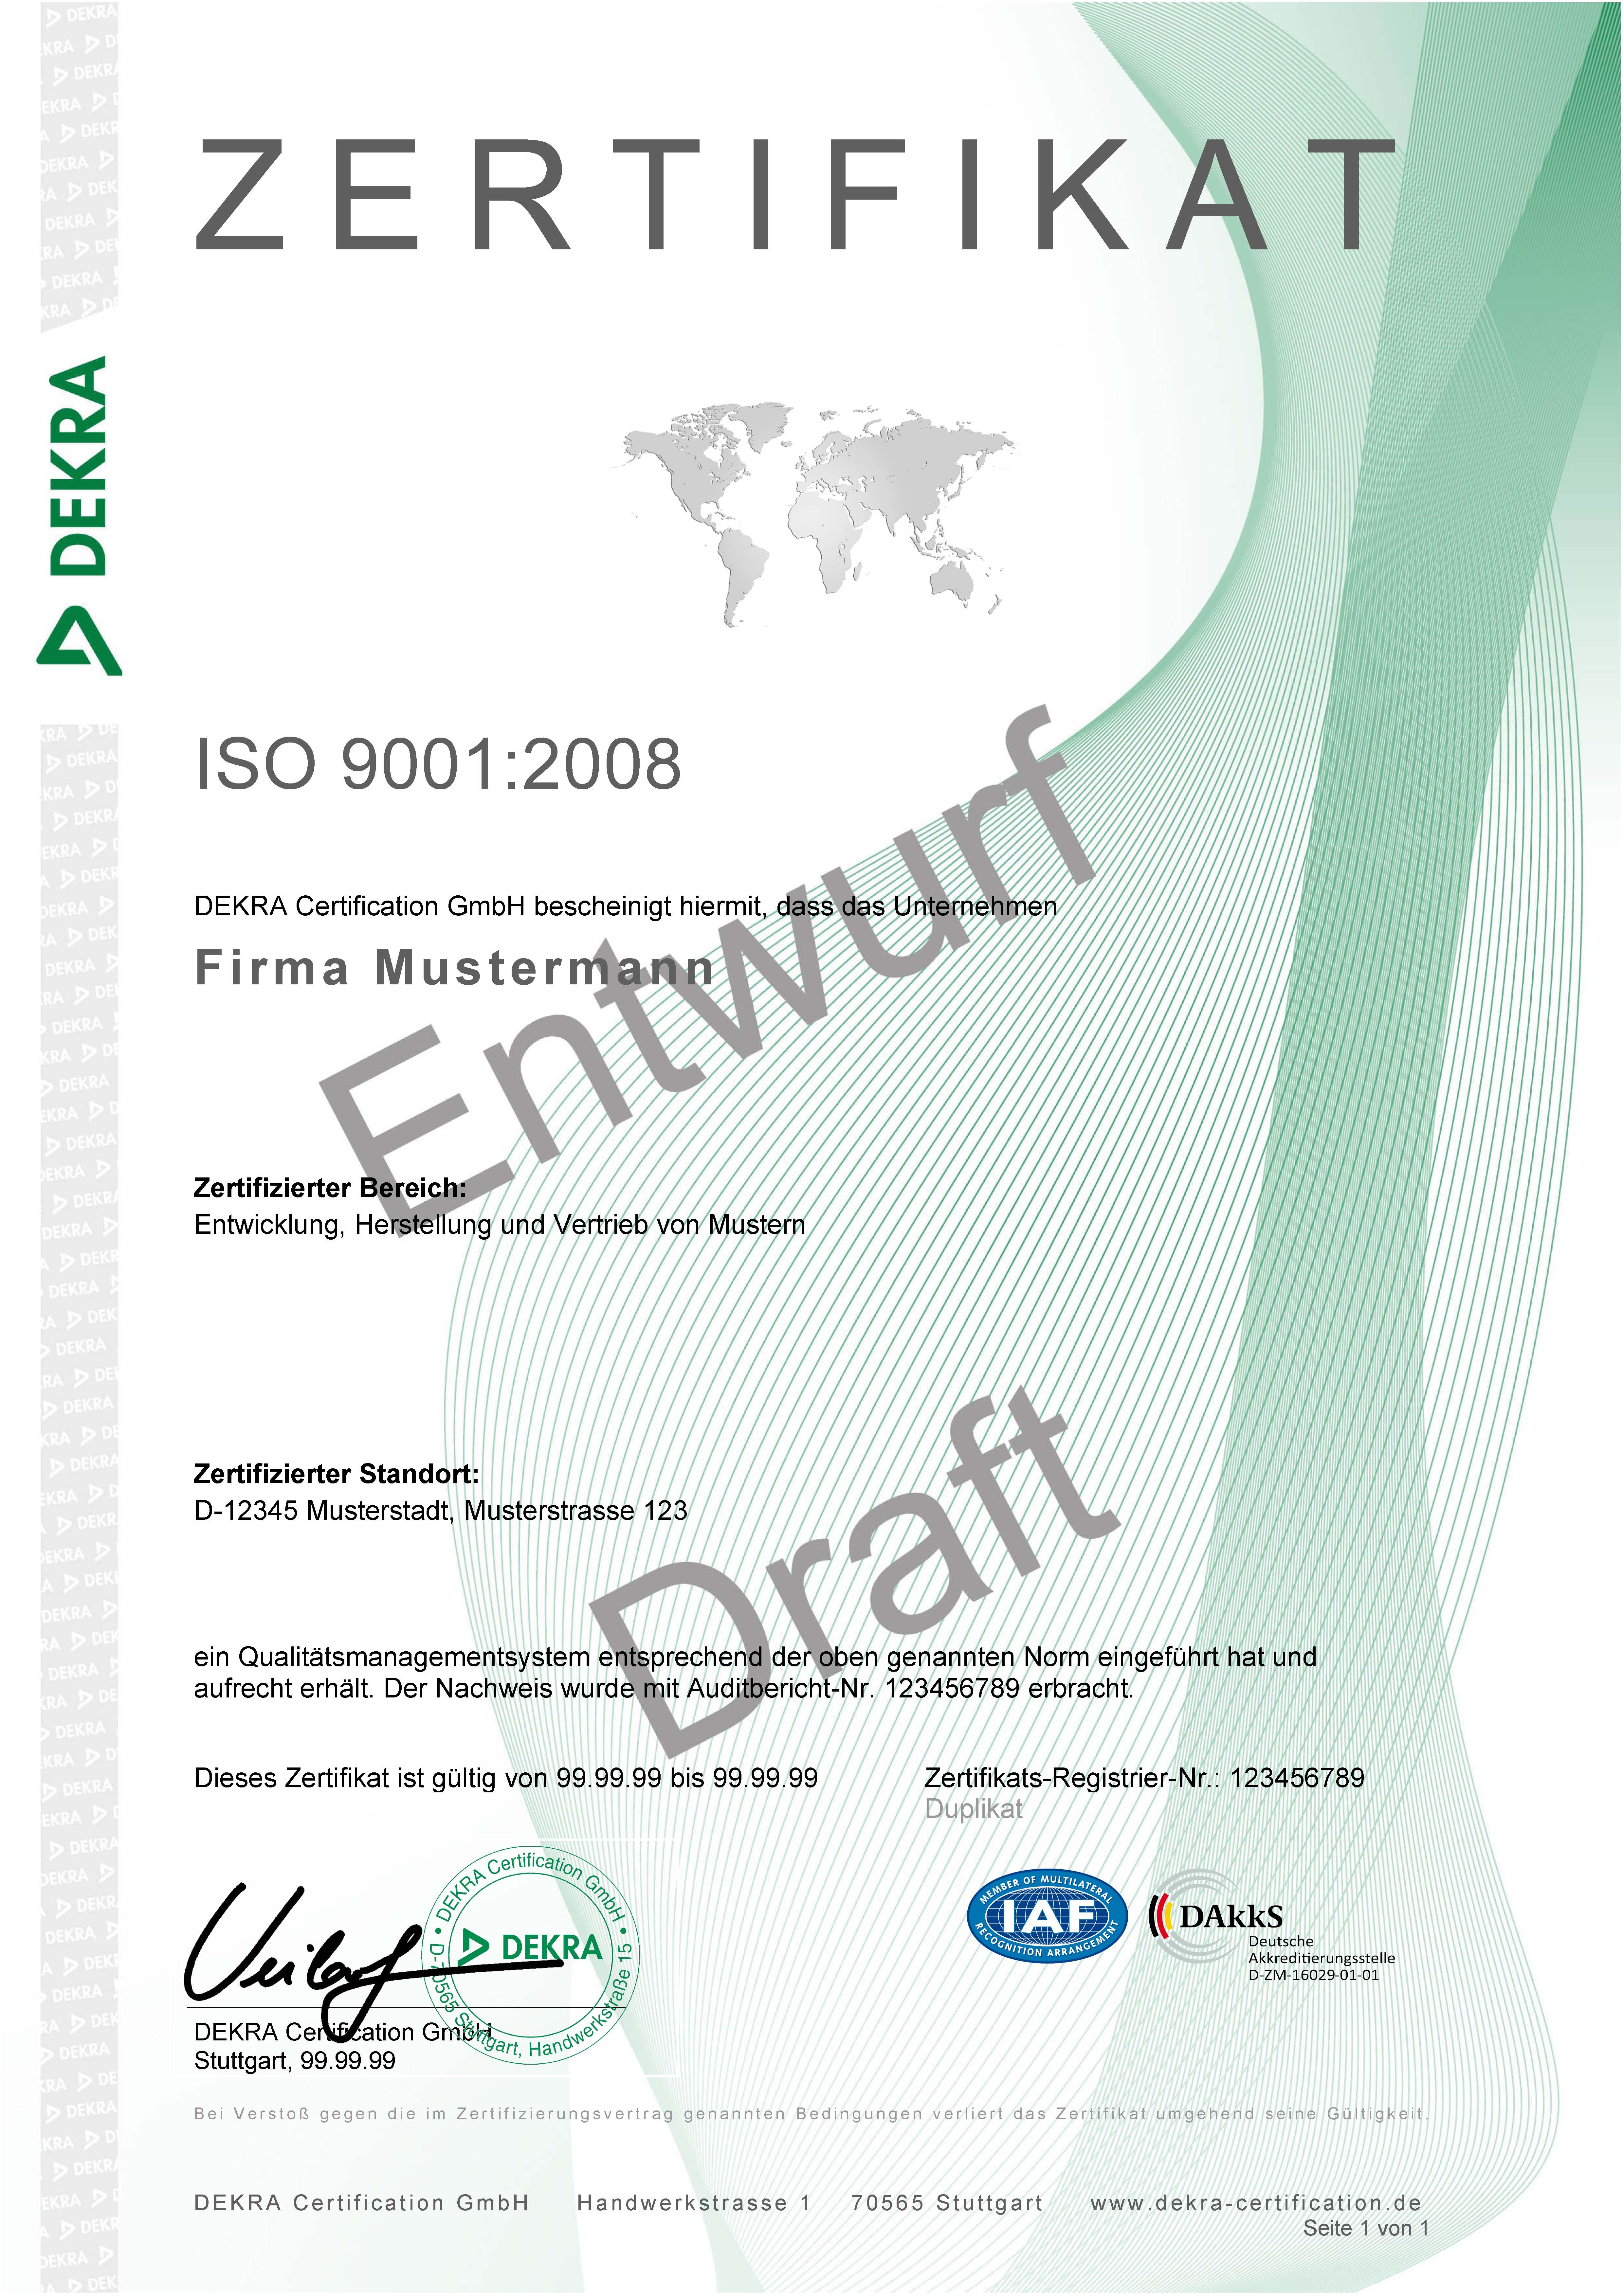 Großzügig Iso 9001 Vorlage Fotos - Entry Level Resume Vorlagen ...